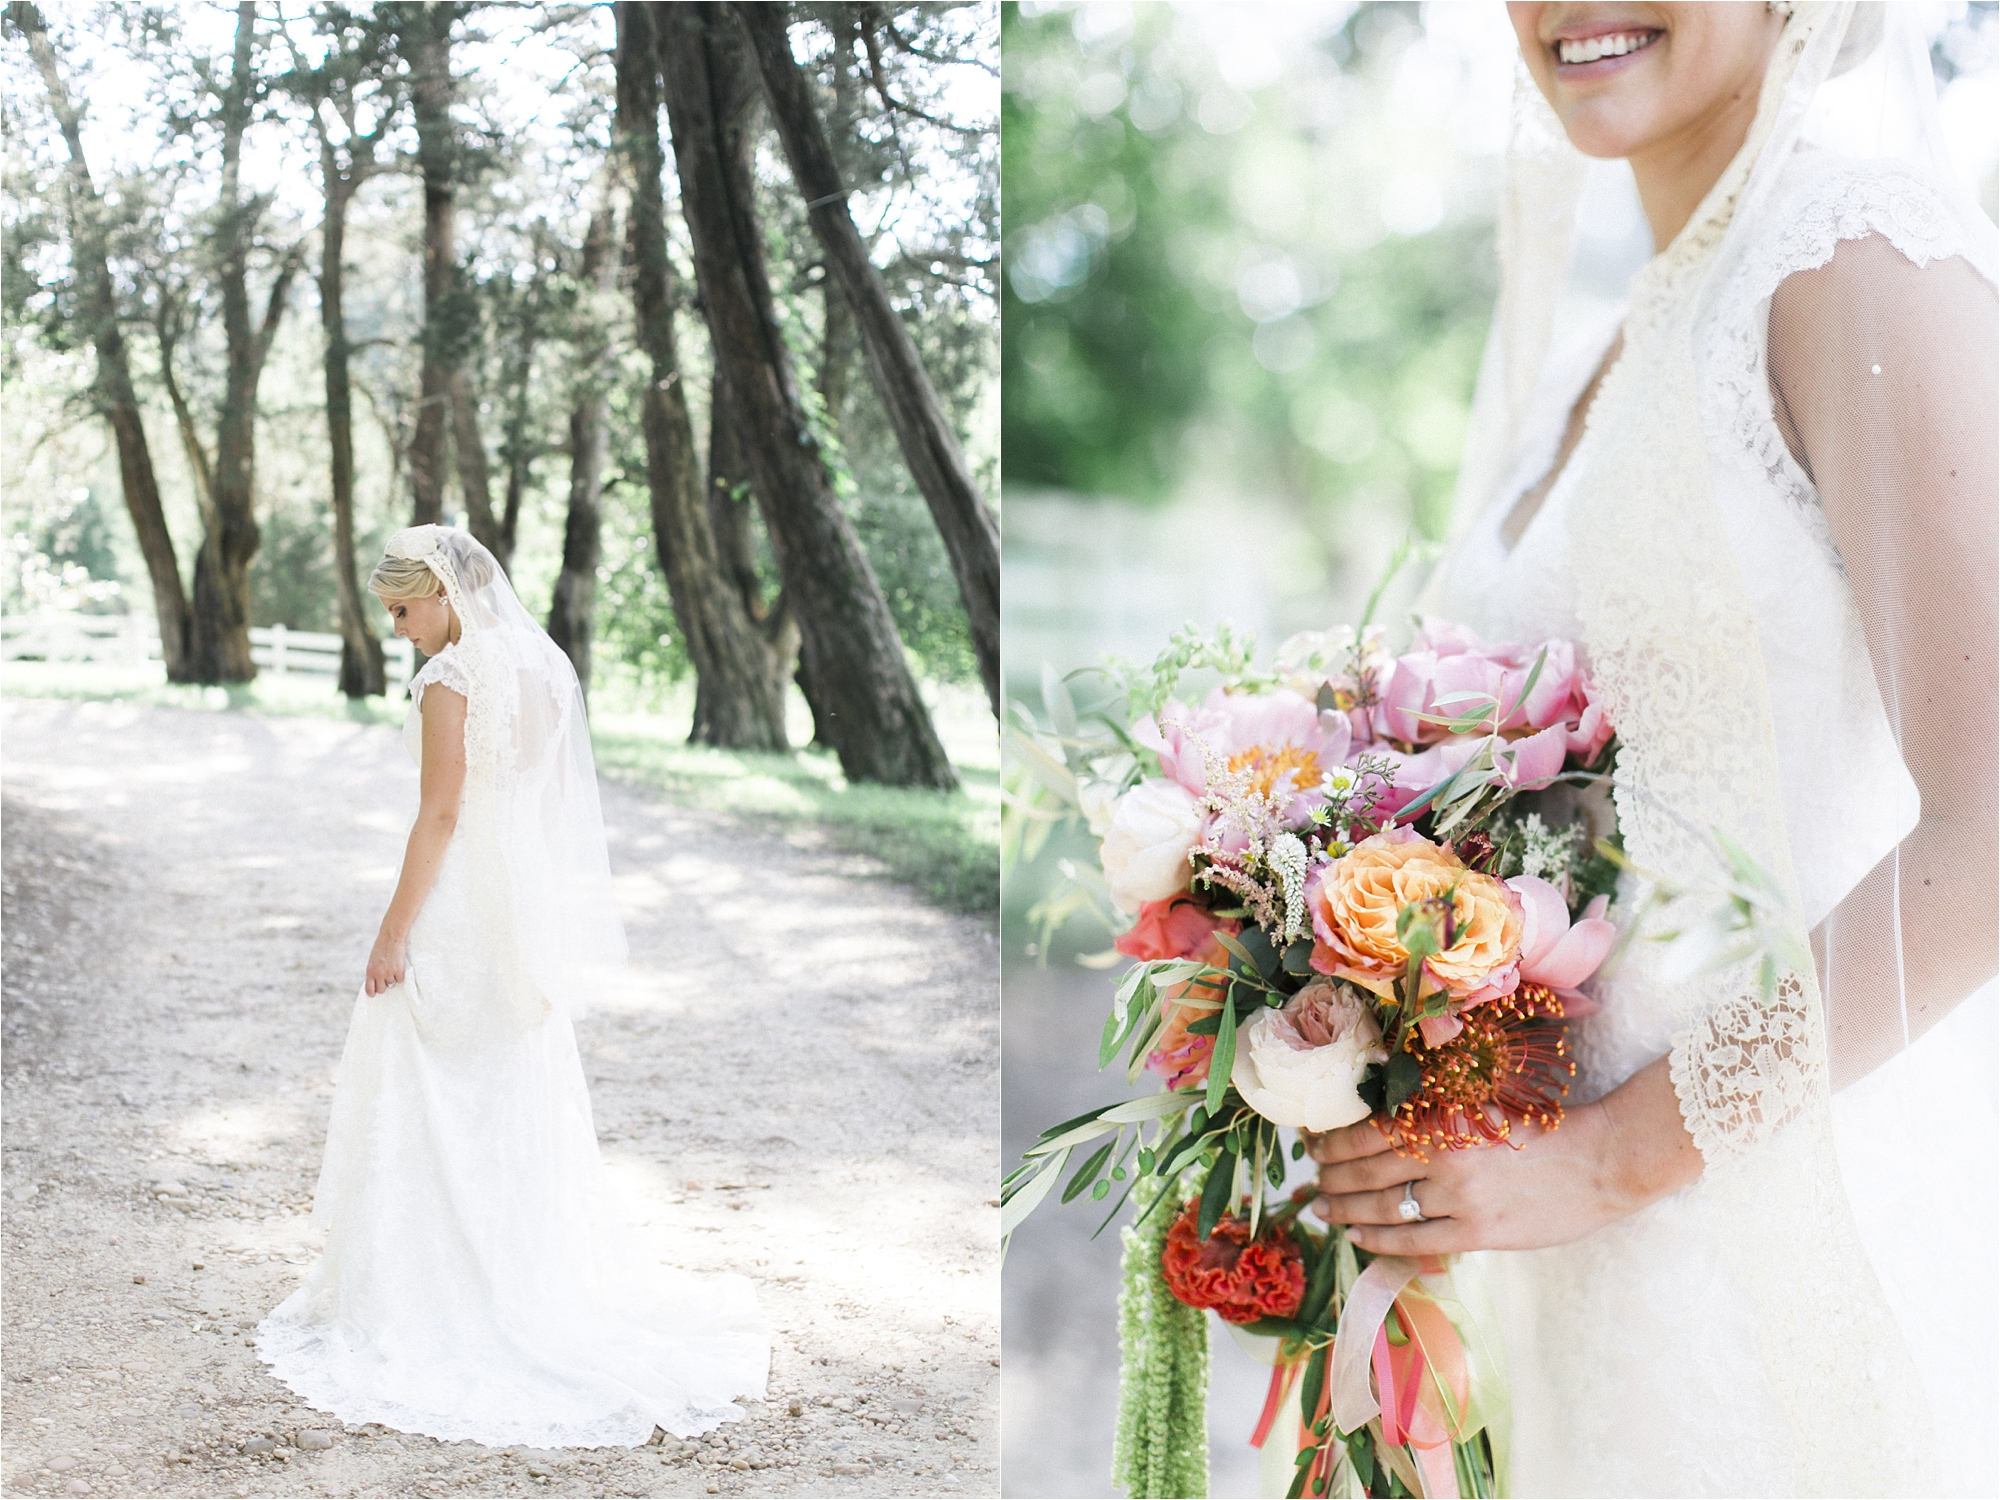 richmond-virginia-tuckahoe-plantation-coral-summer-wedding-stephanie-yonce-photos_0020.jpg